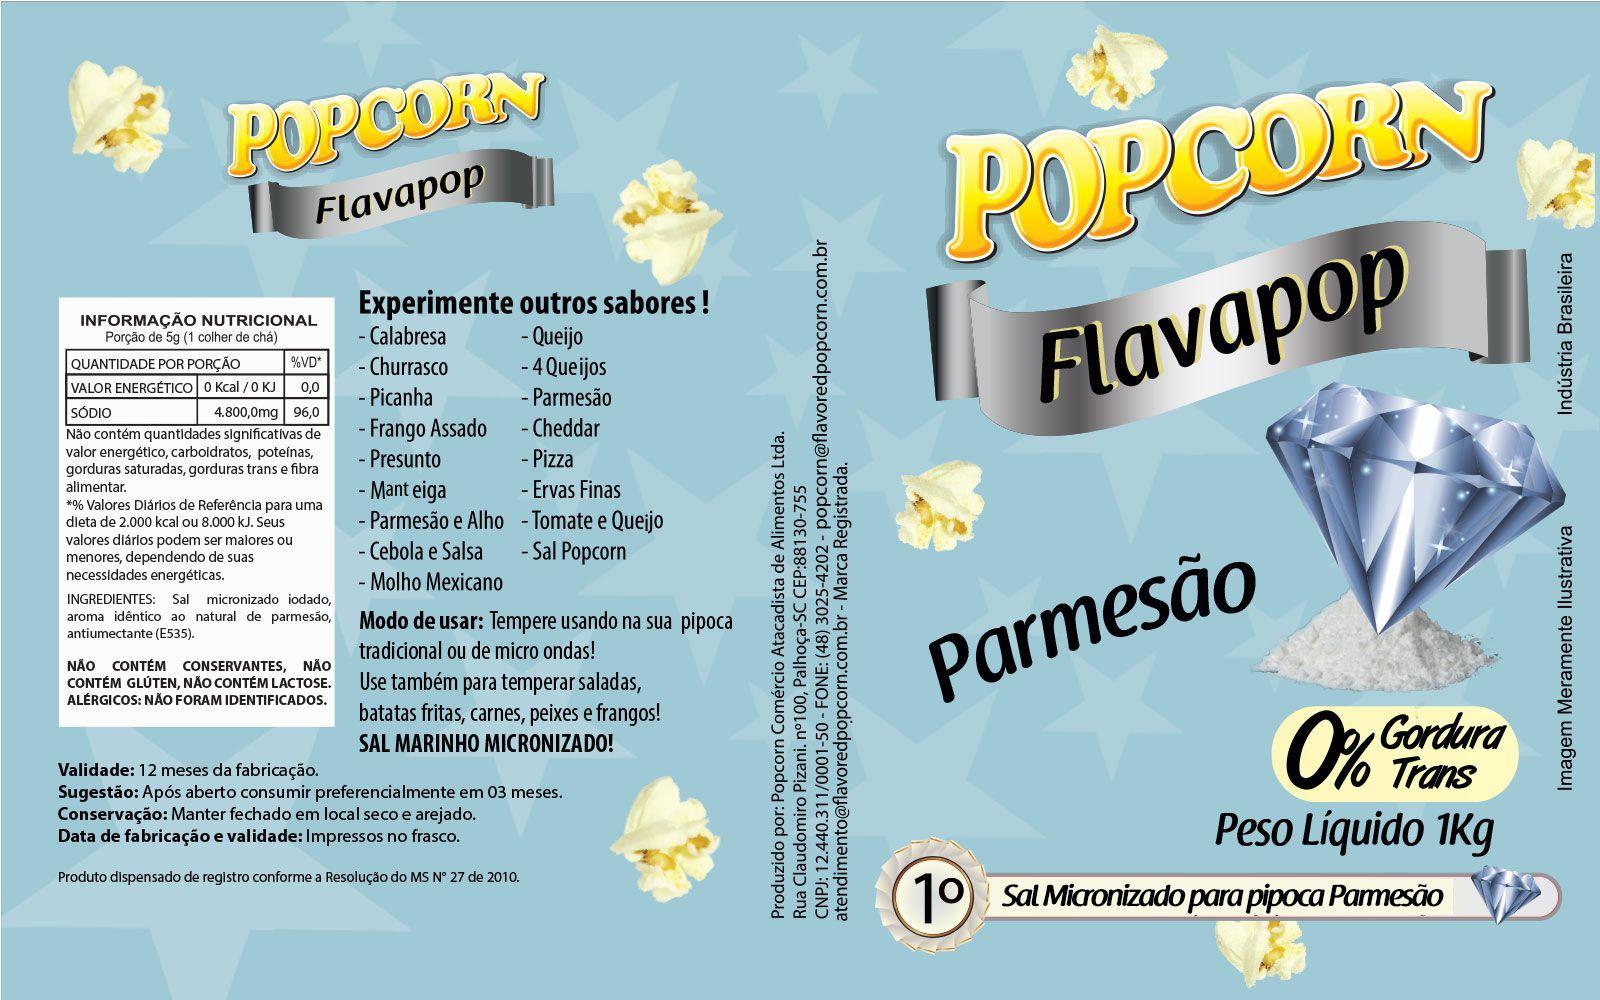 FLAVAPOP - Original de cinema -  Parmesão - Micronizado Popcorn  - Pct 1kg